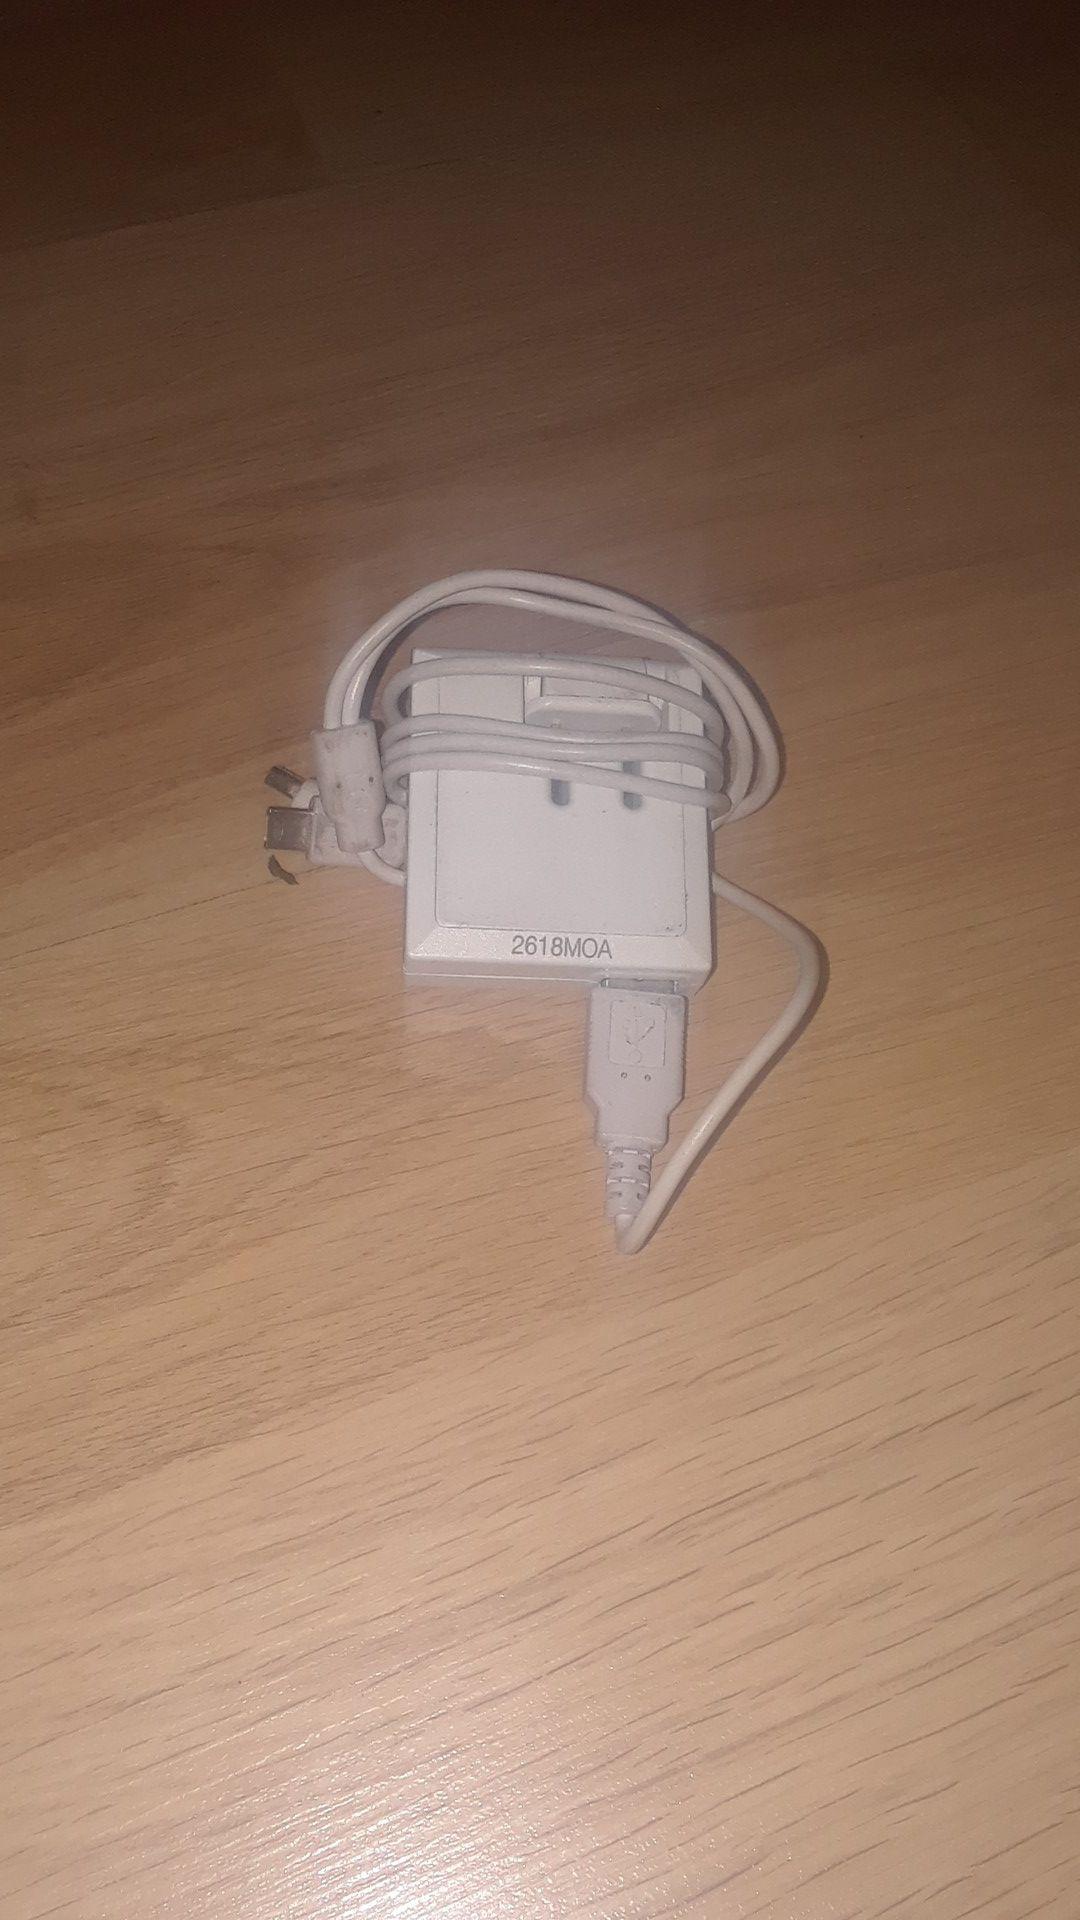 (TRADE OFFER!)Modded New Nintendo 2ds XL!